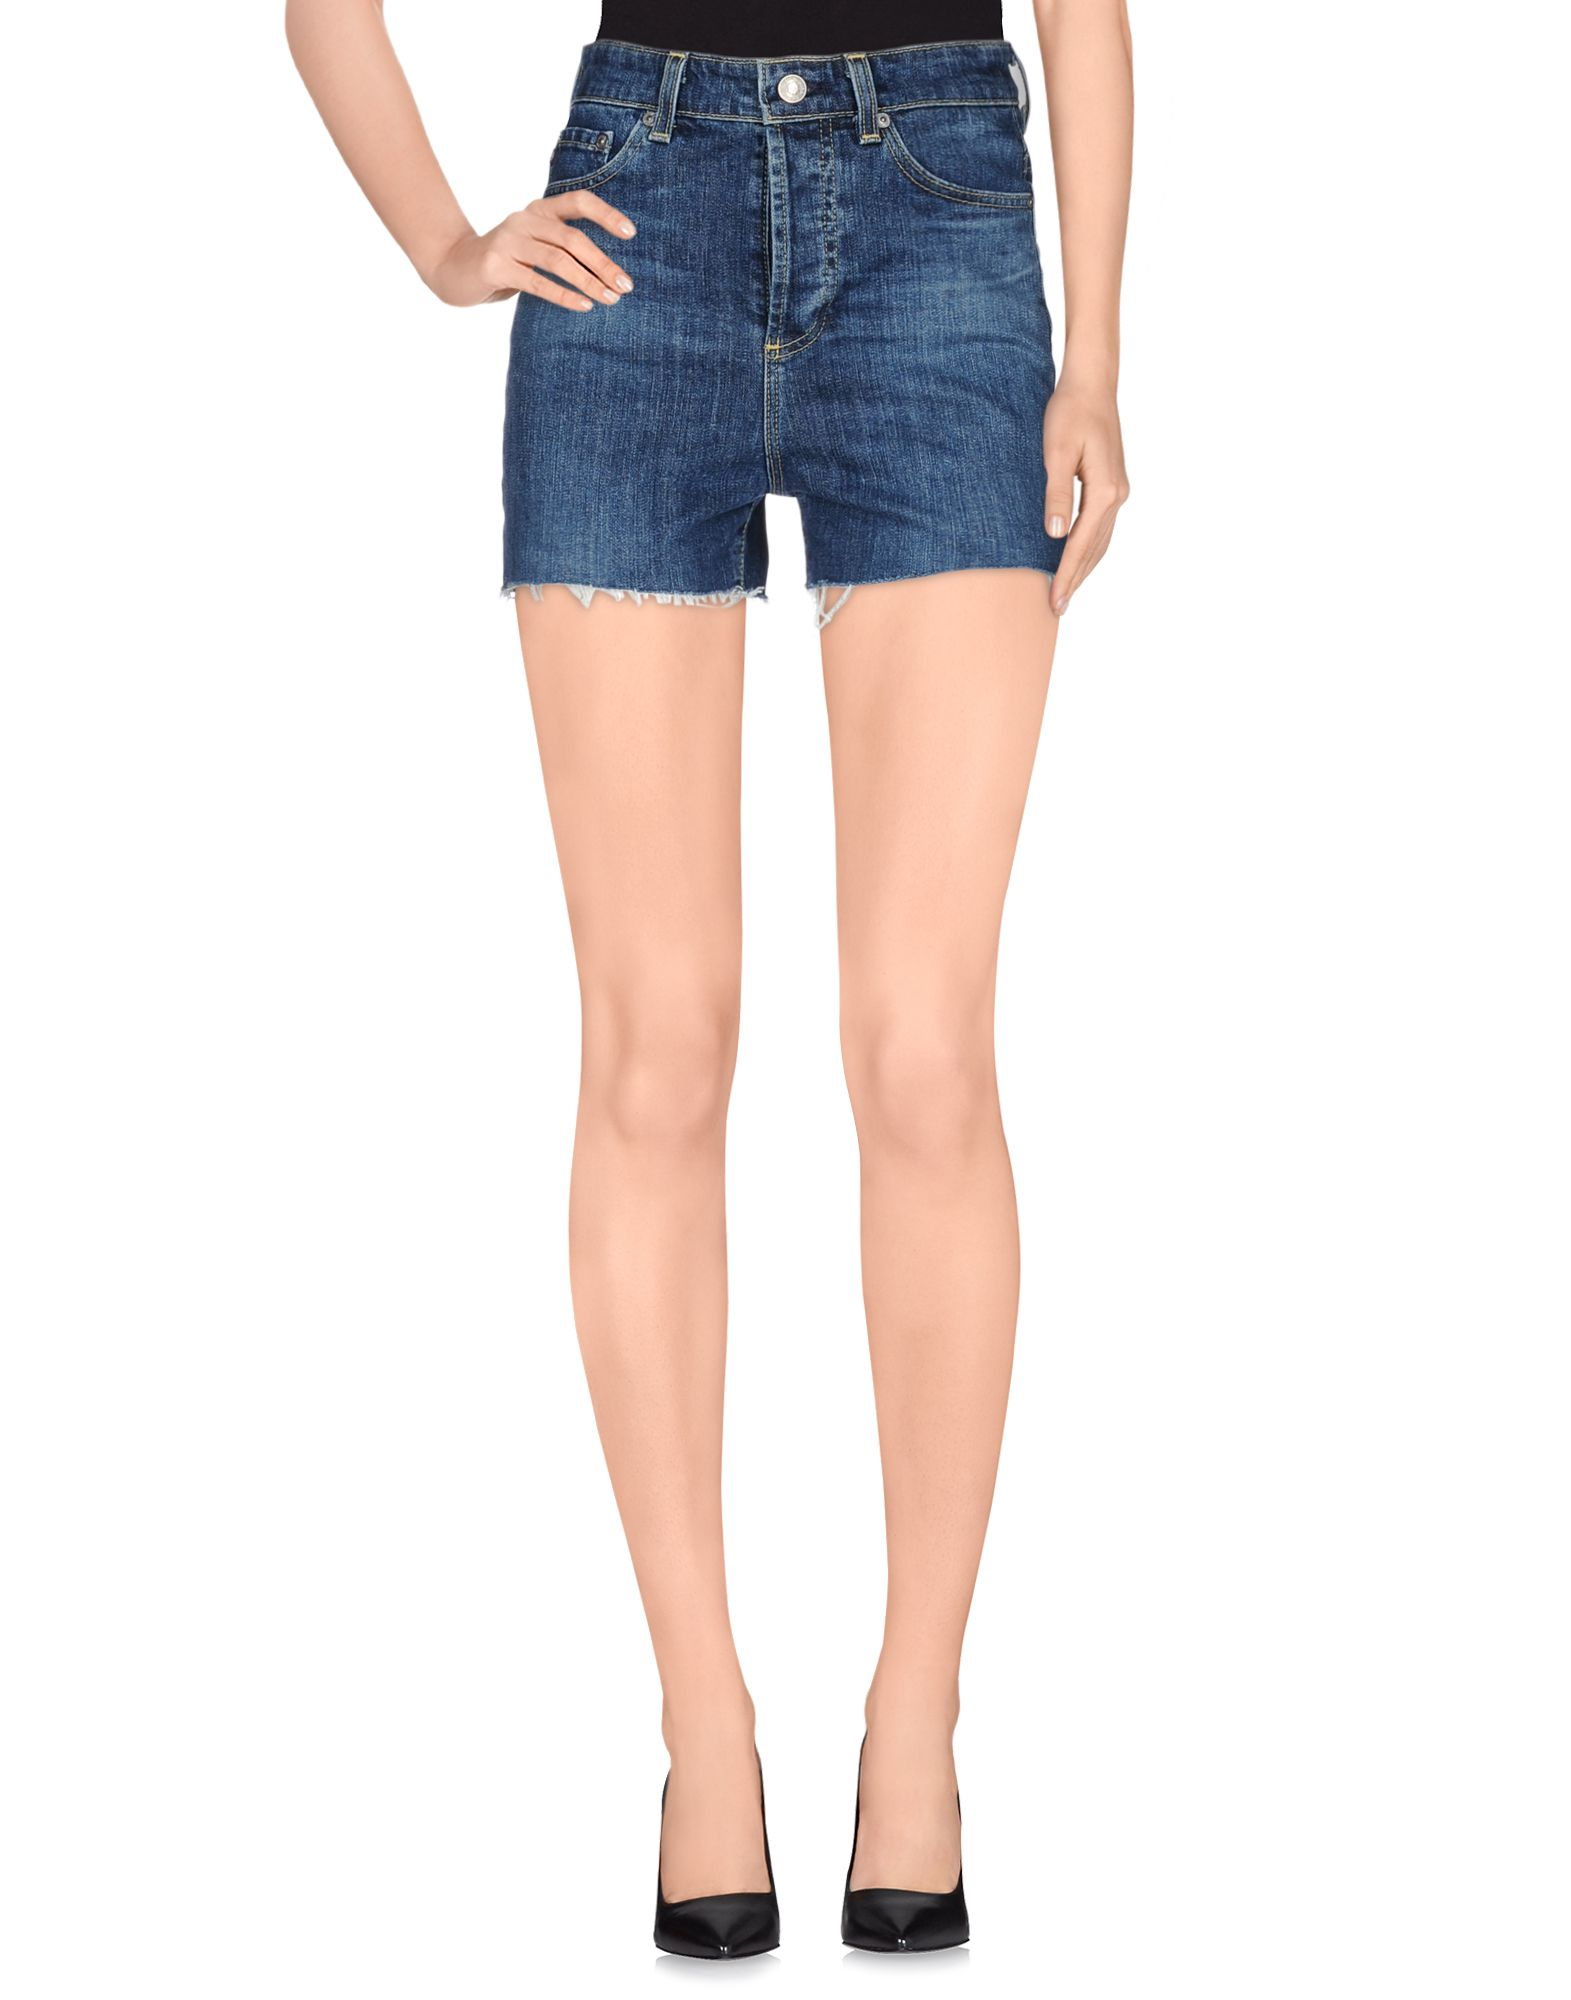 ALEXA CHUNG for AG Jeans Джинсовые шорты